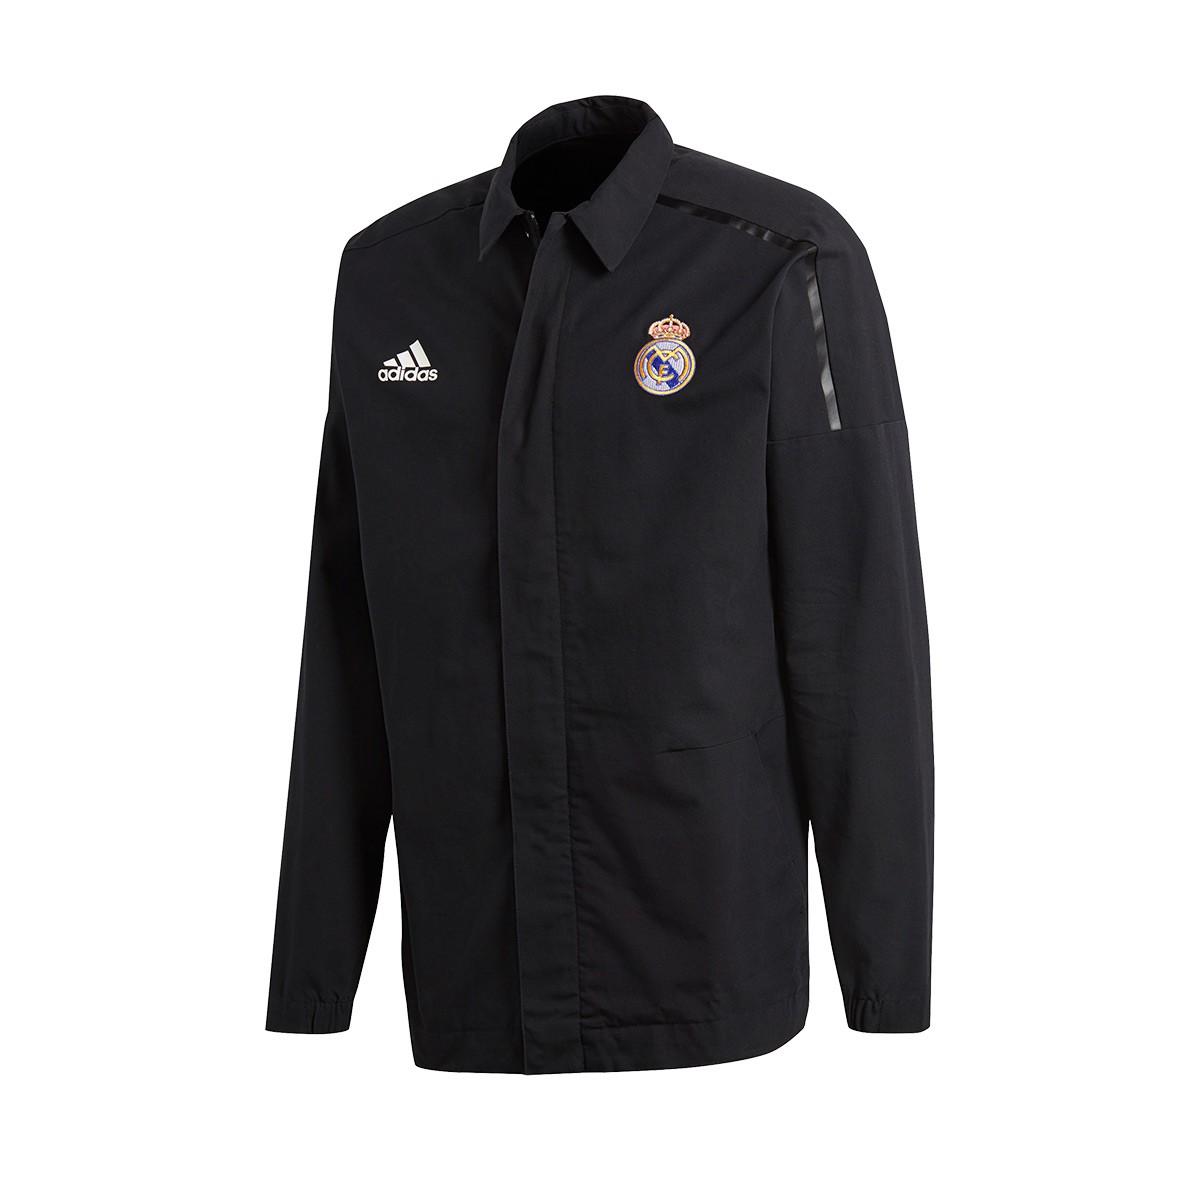 919808c1fec6b Jacket adidas Kids Real Madrid ZNE JKT WV 2017-2018 Black - Tienda ...